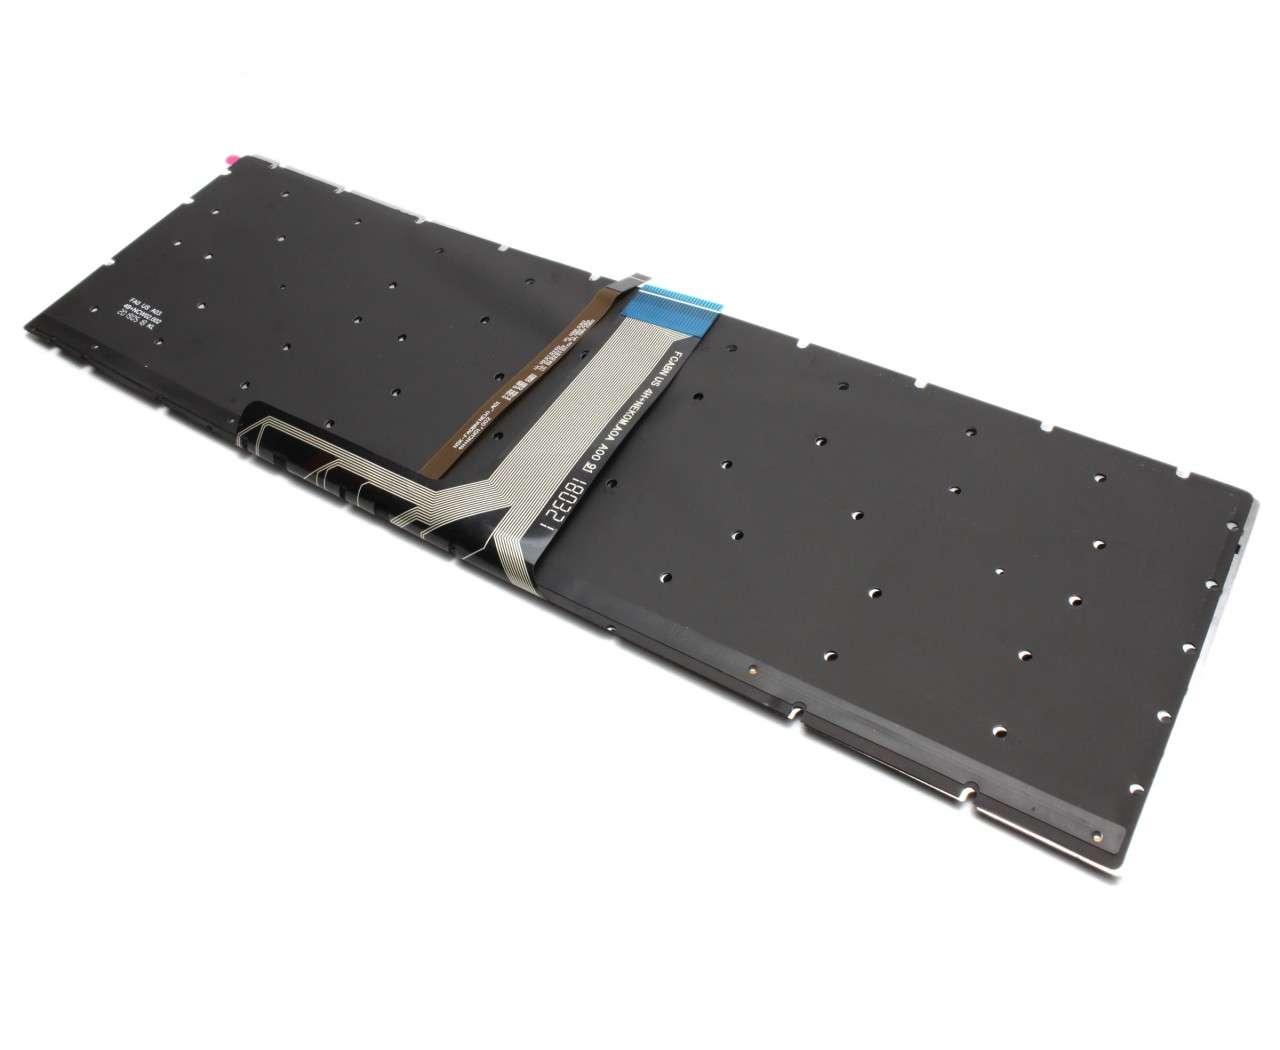 Tastatura MSI GE63VR 7RF Raider iluminata layout US fara rama enter mic imagine powerlaptop.ro 2021